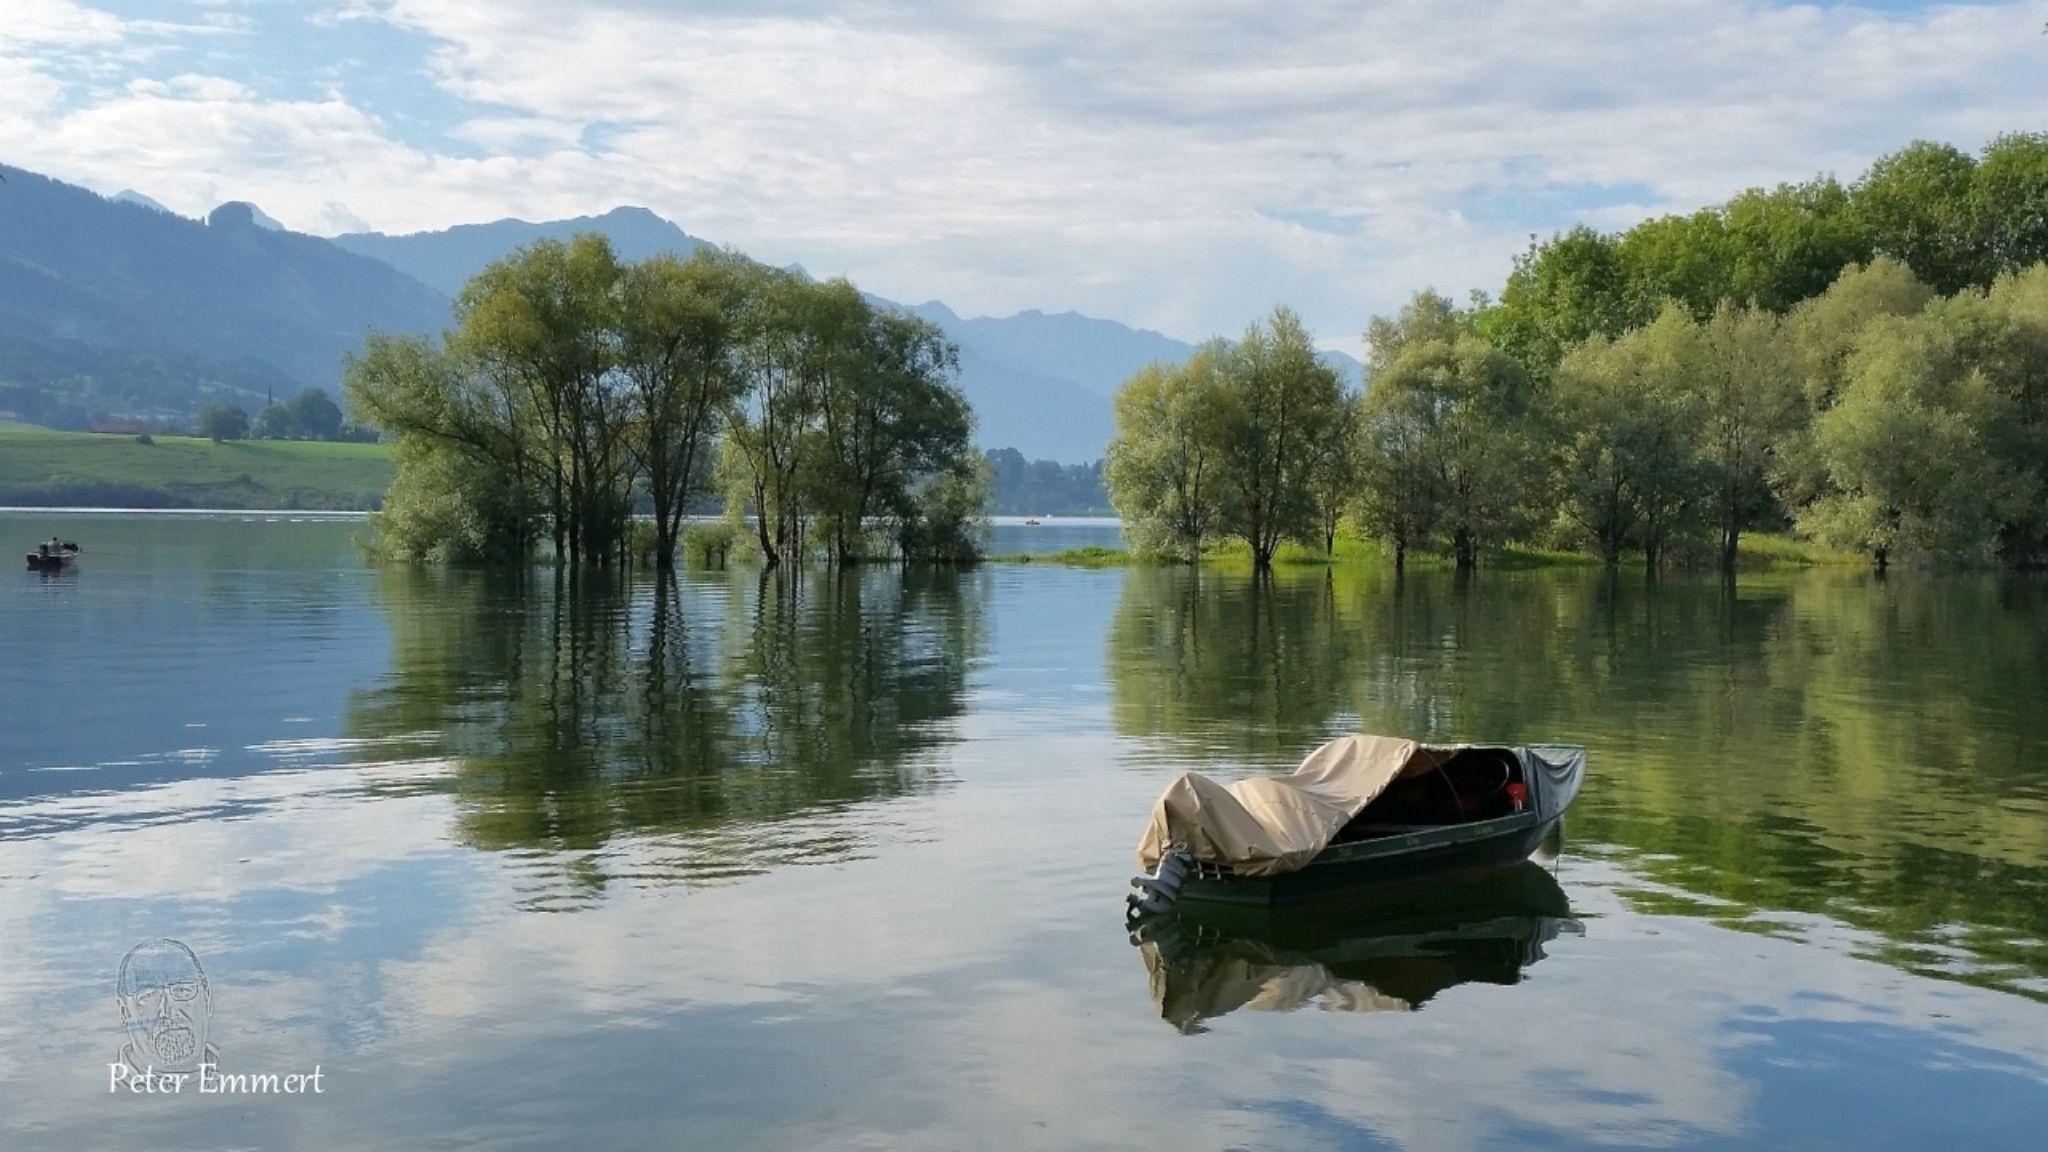 Lac de la Gruyère, one by Peter Emmert